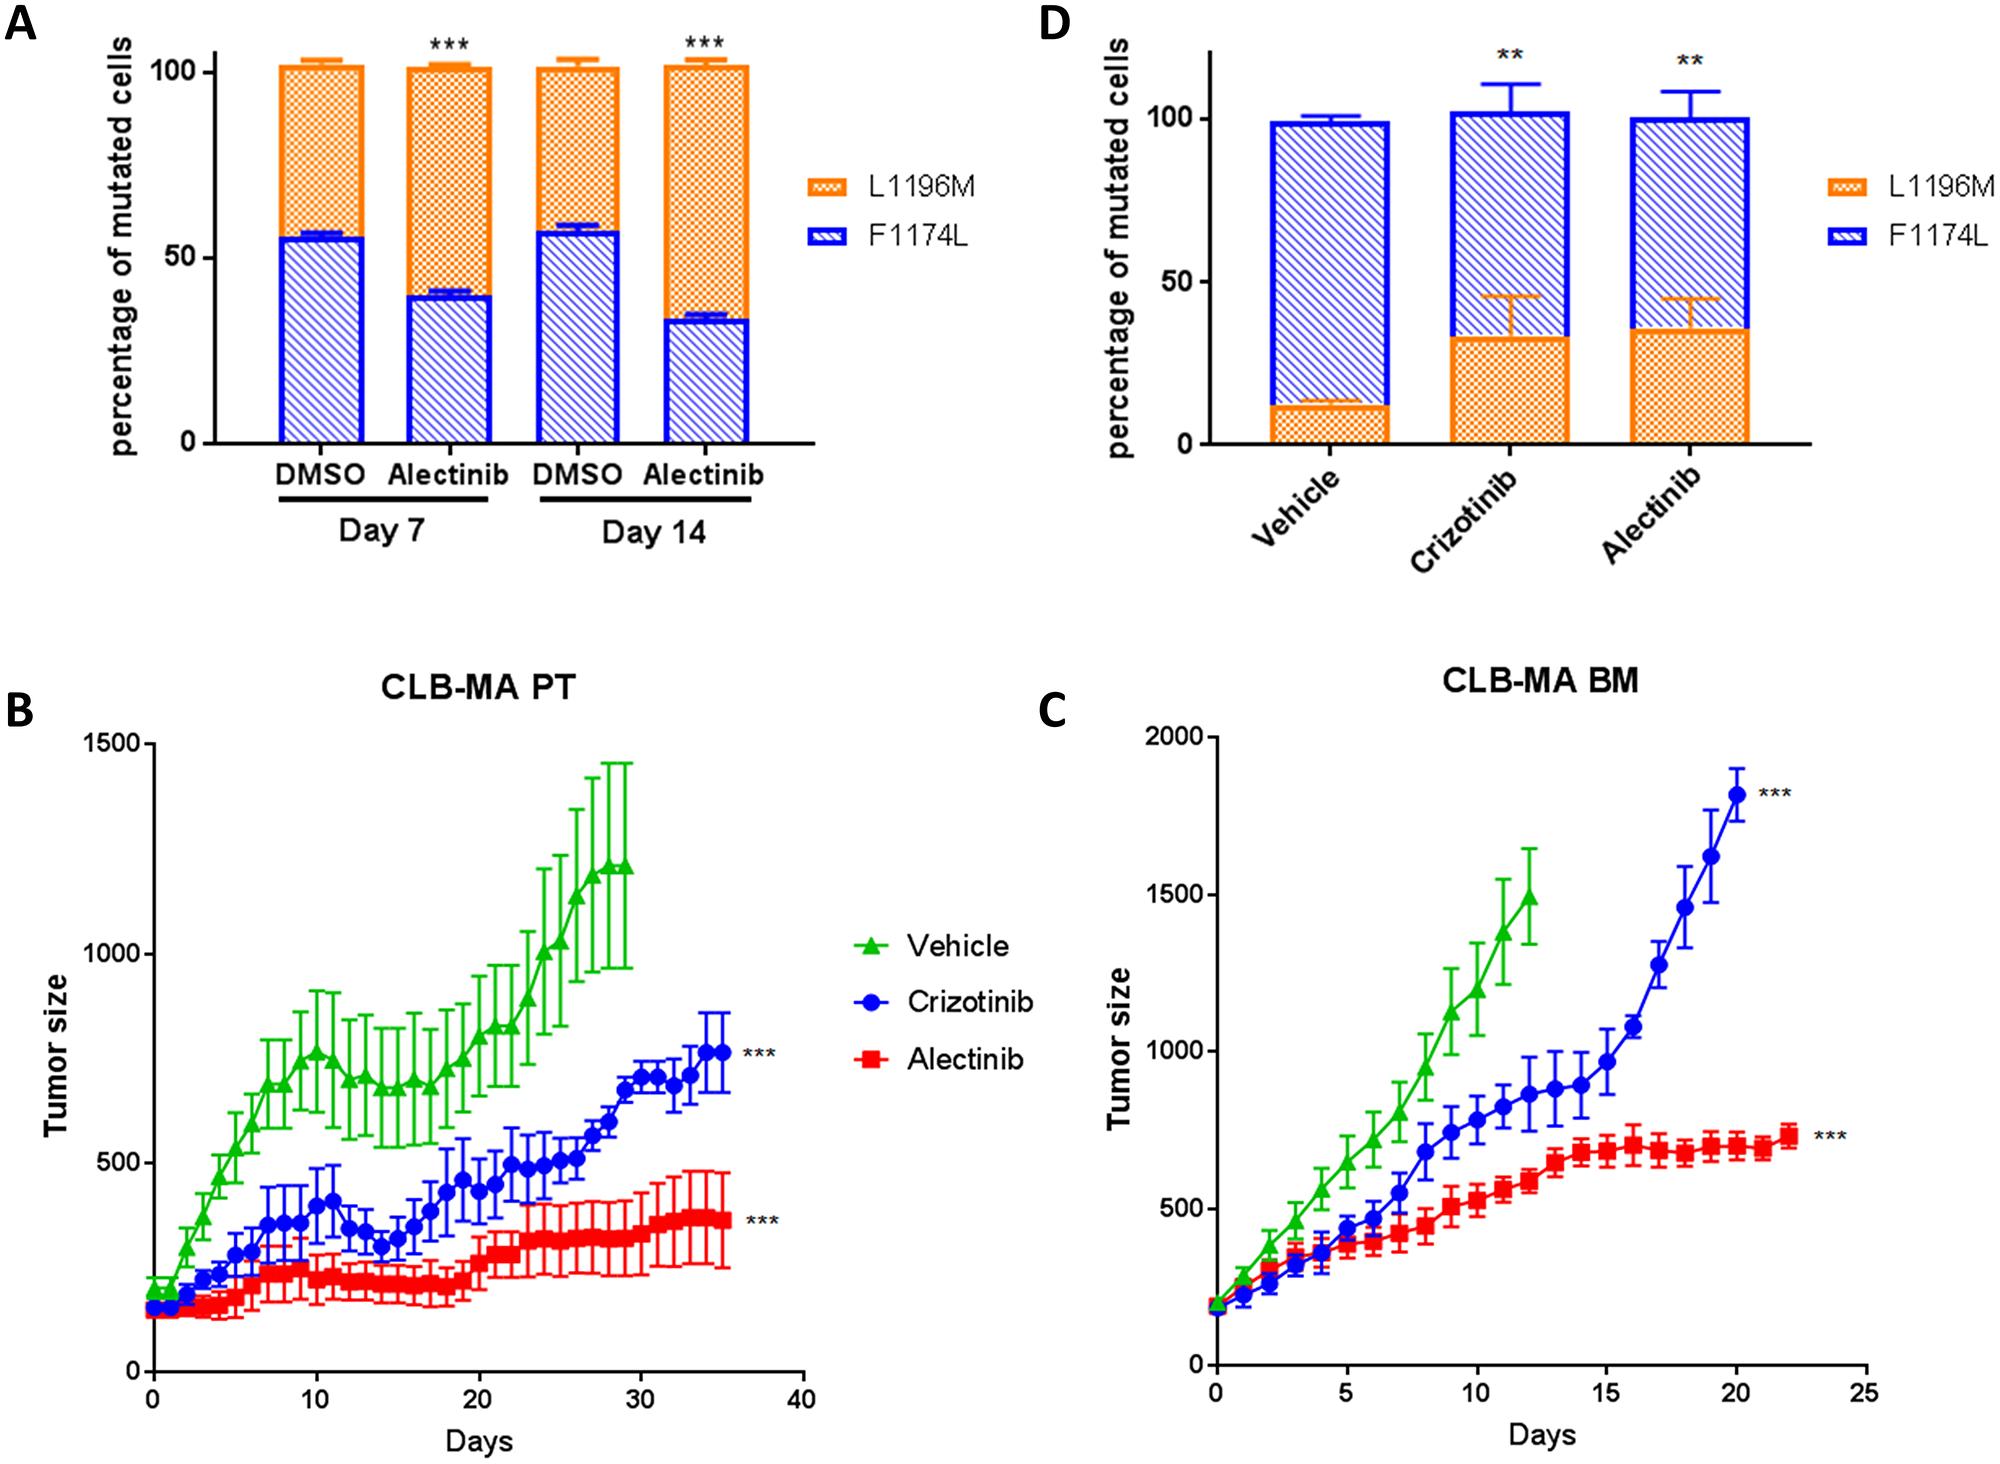 Sensitivity of ALK F1174L and L1196M mutations to ALK inhibitors in vitro and in vivo.